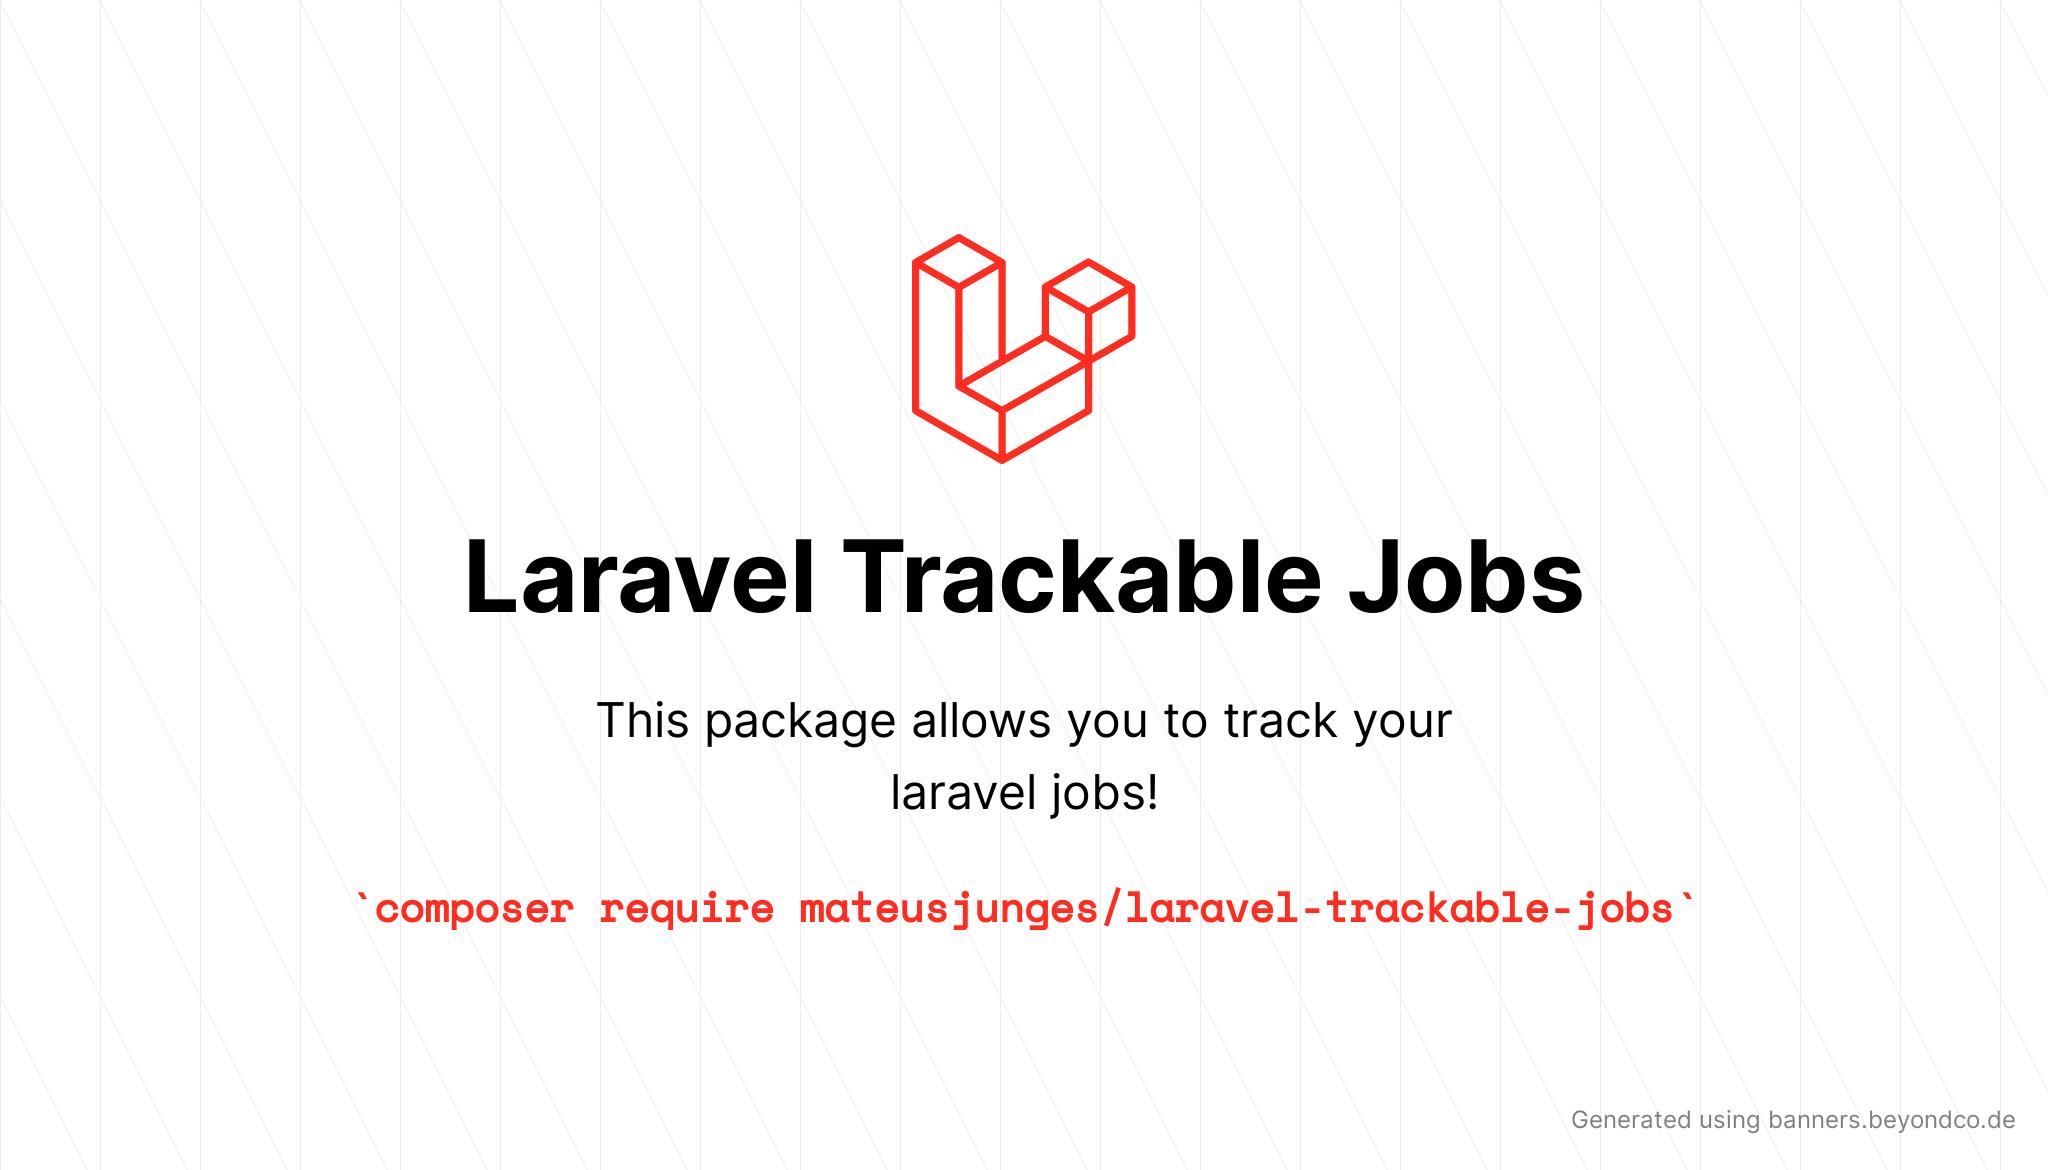 Trackable jobs for laravel